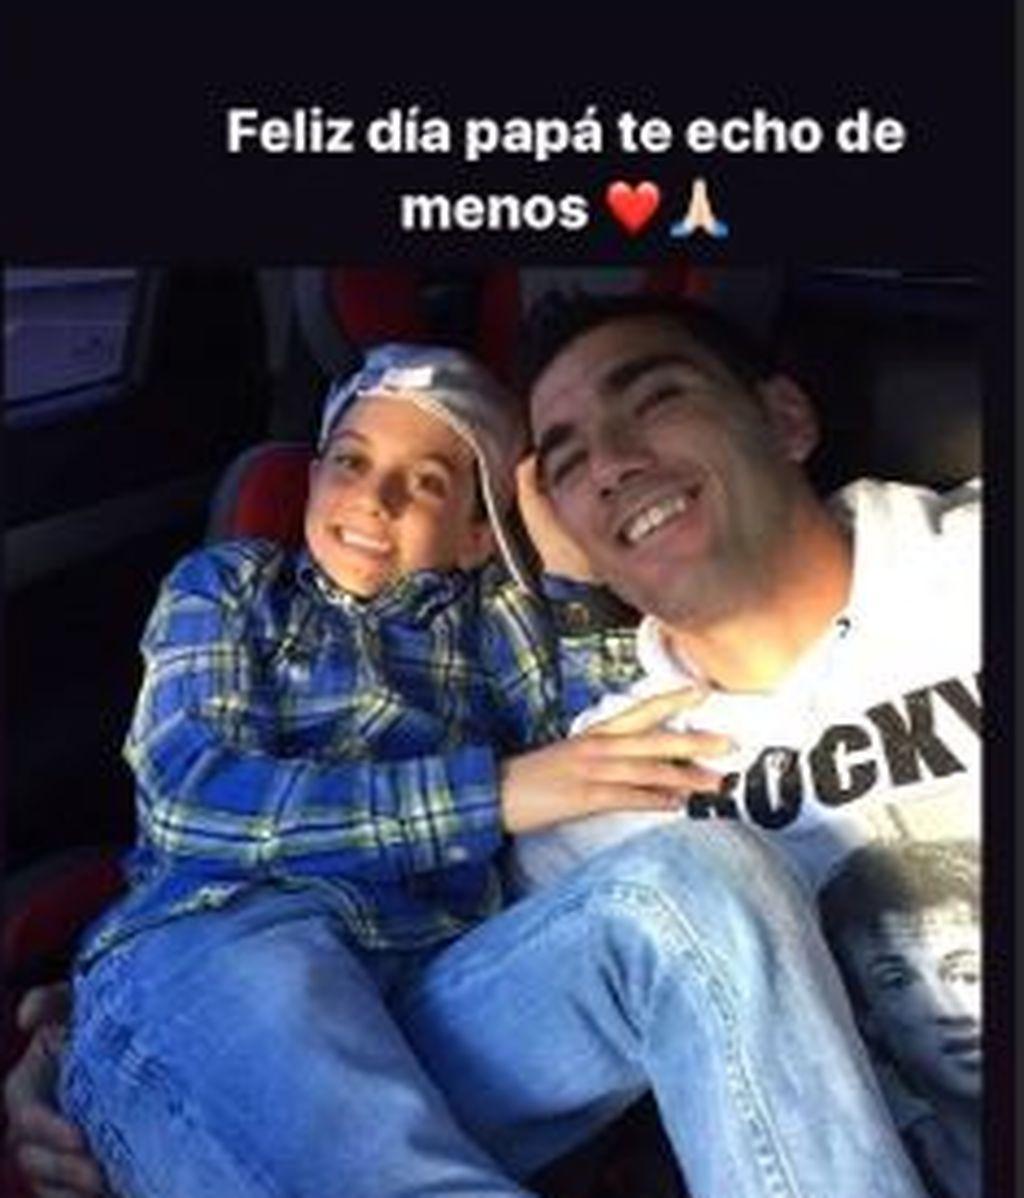 Mensaje de Jose Reyes a su padre